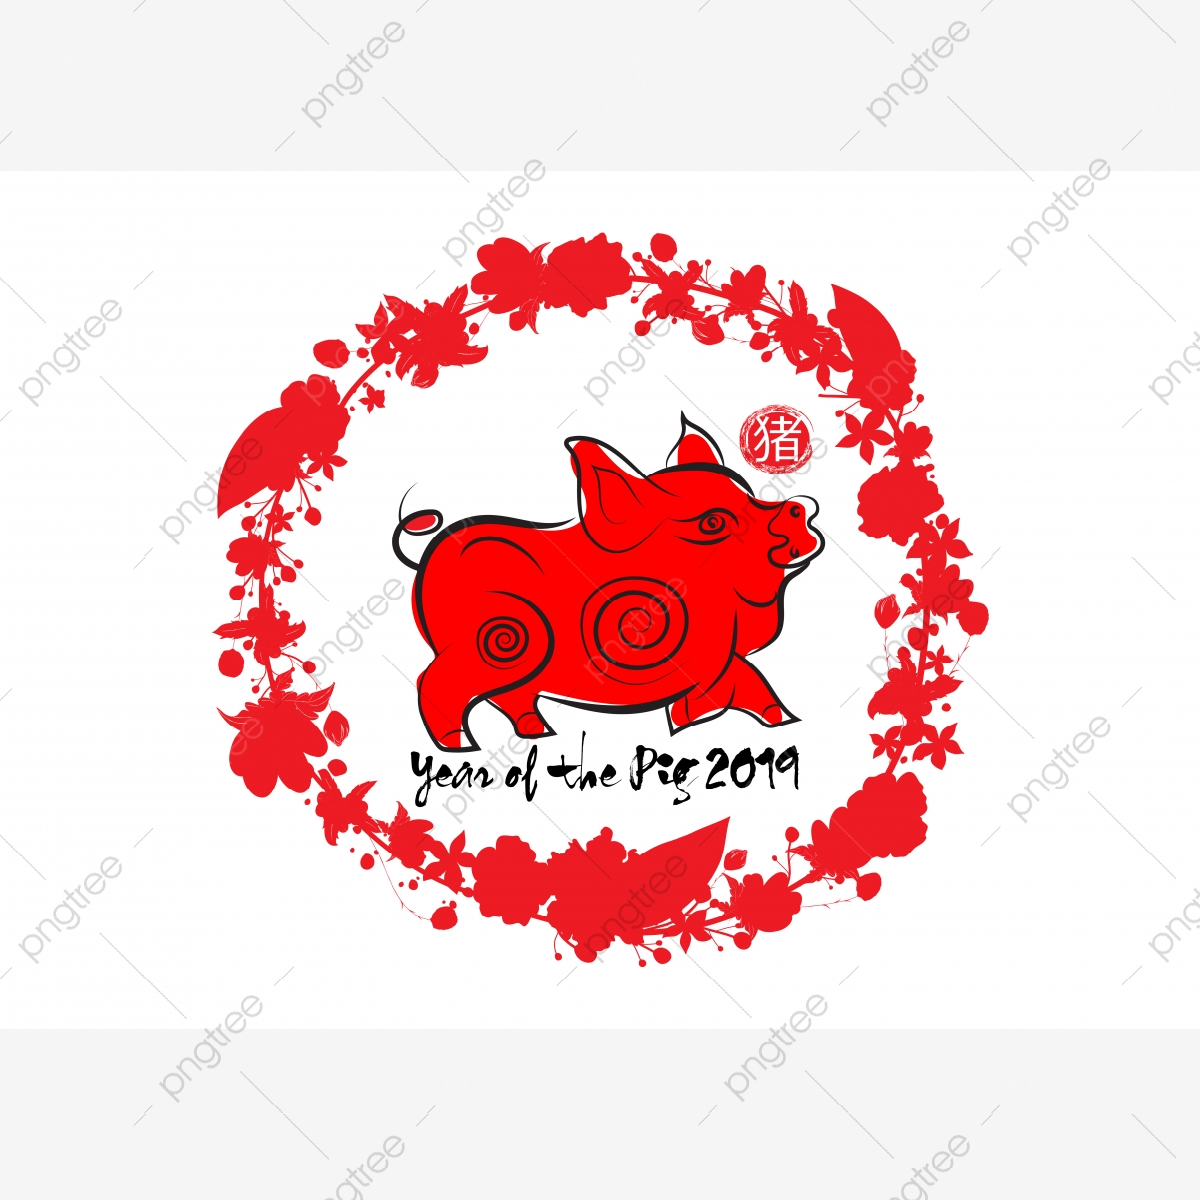 87 Gambar Babi Merah HD